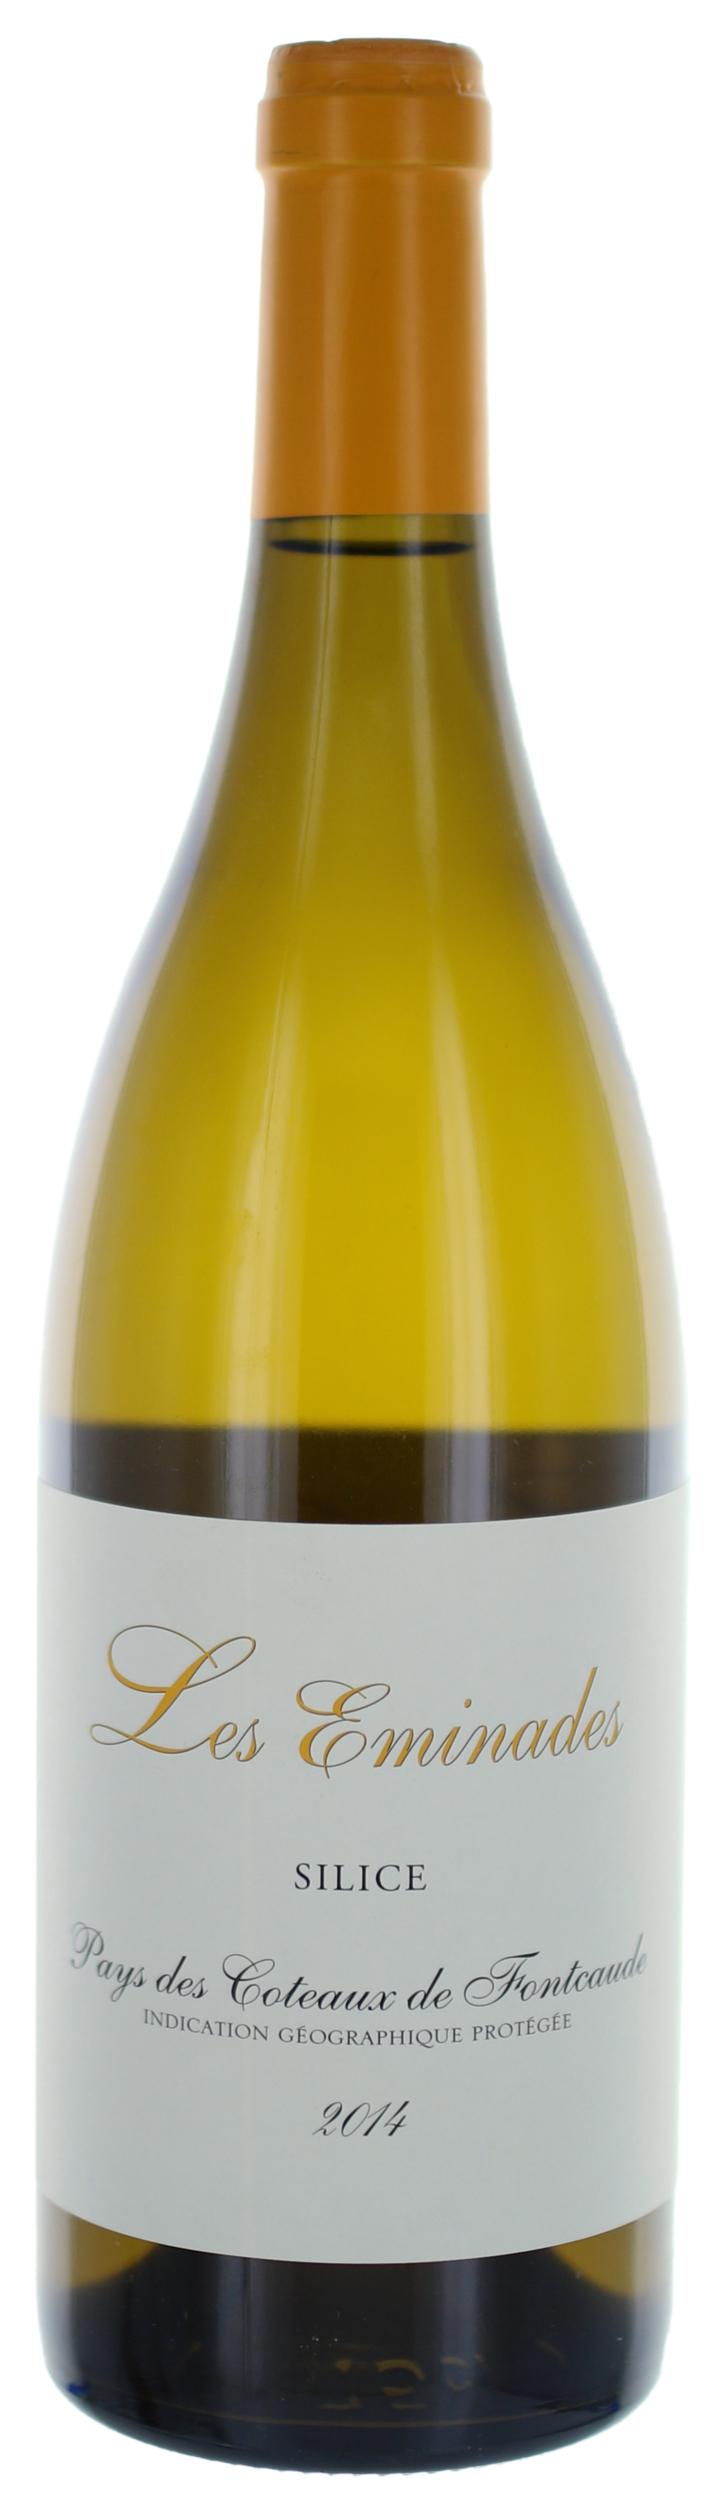 Vin de Pays - Silice - Les Eminades - 2018 - BIO